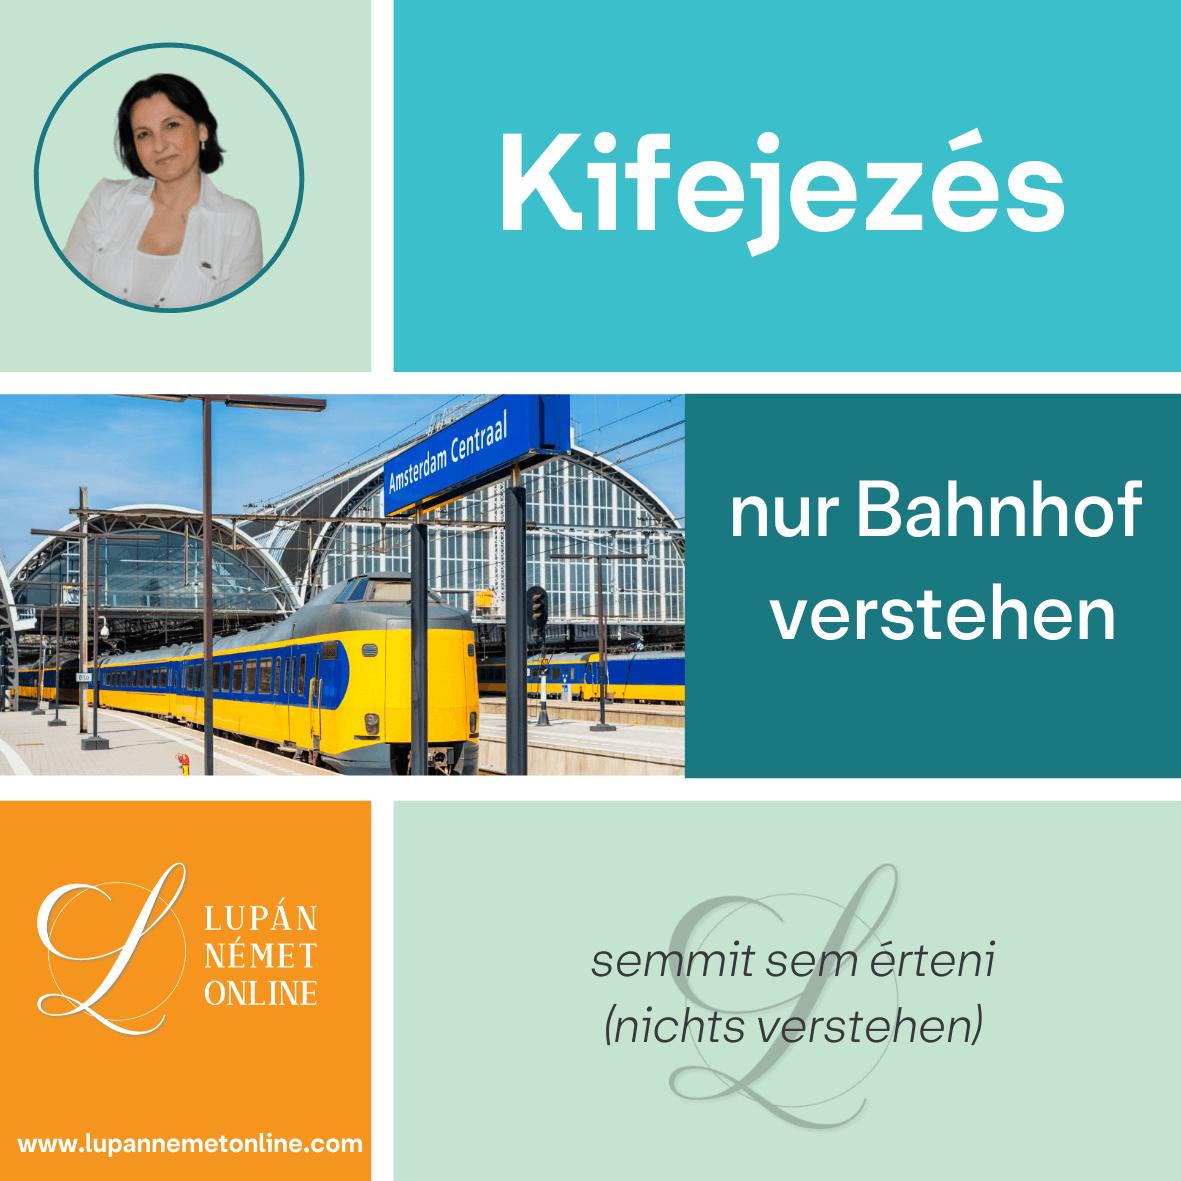 Kifejezés_Bahnhof